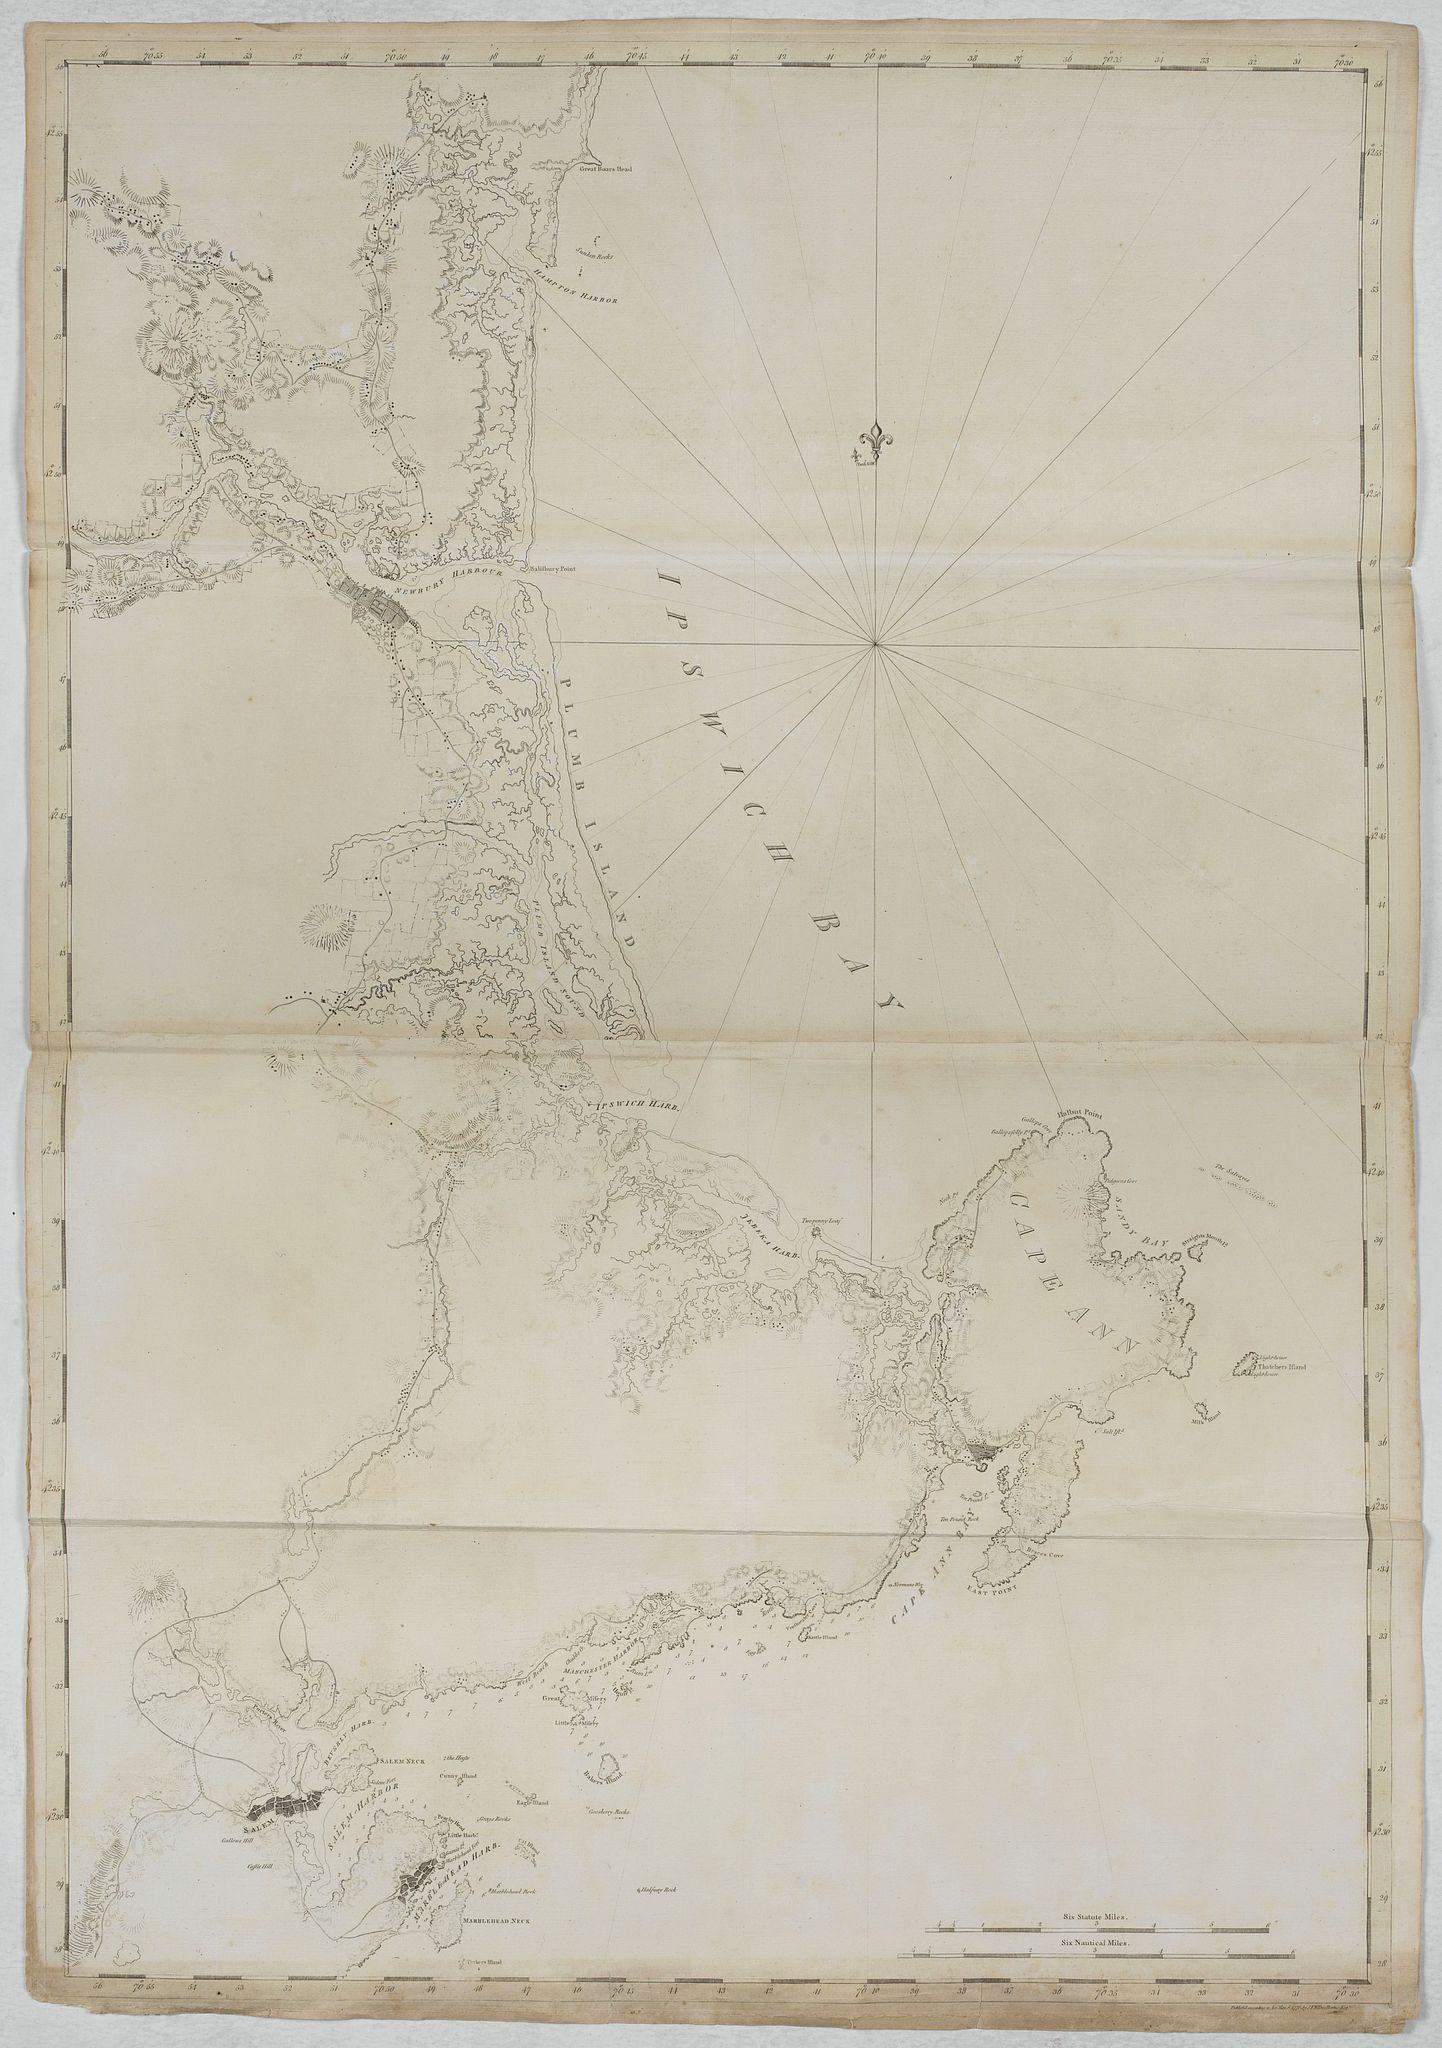 DES BARRES, J.F.W. -  [ Ipswich Bay ]